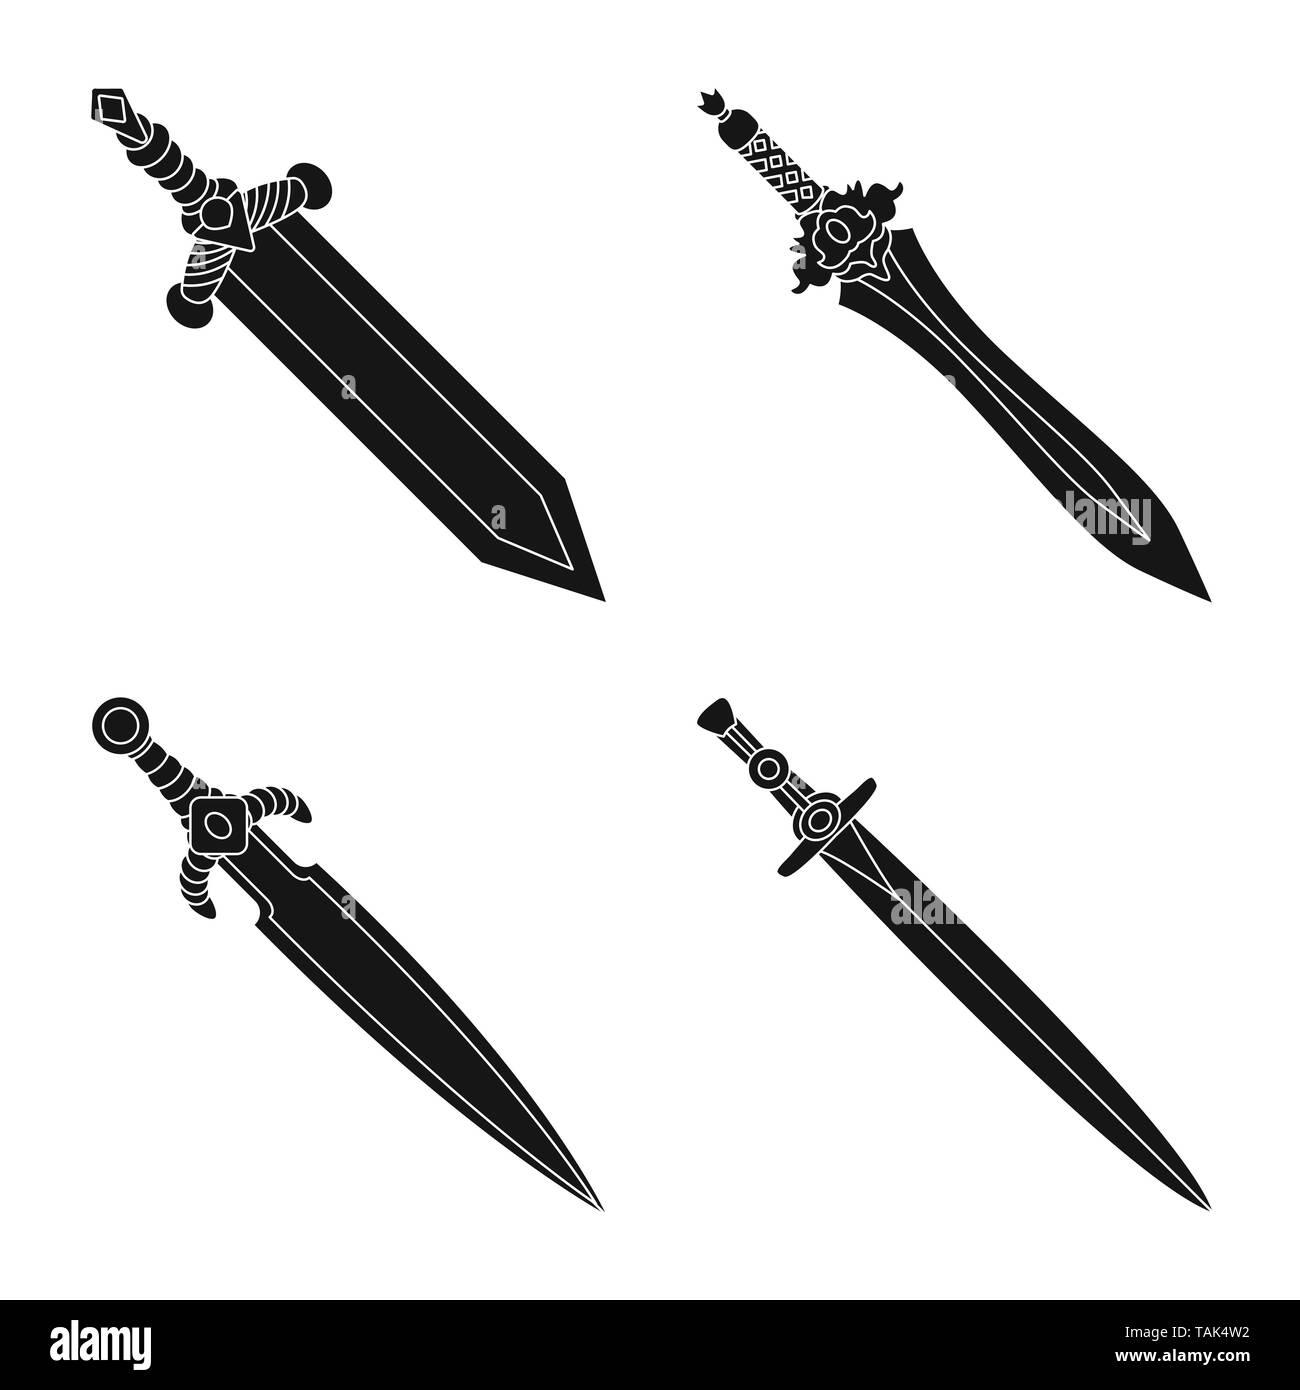 Vector illustration of sharp and blade  logo. Set of sharp and dagger  vector icon for stock. - Stock Image